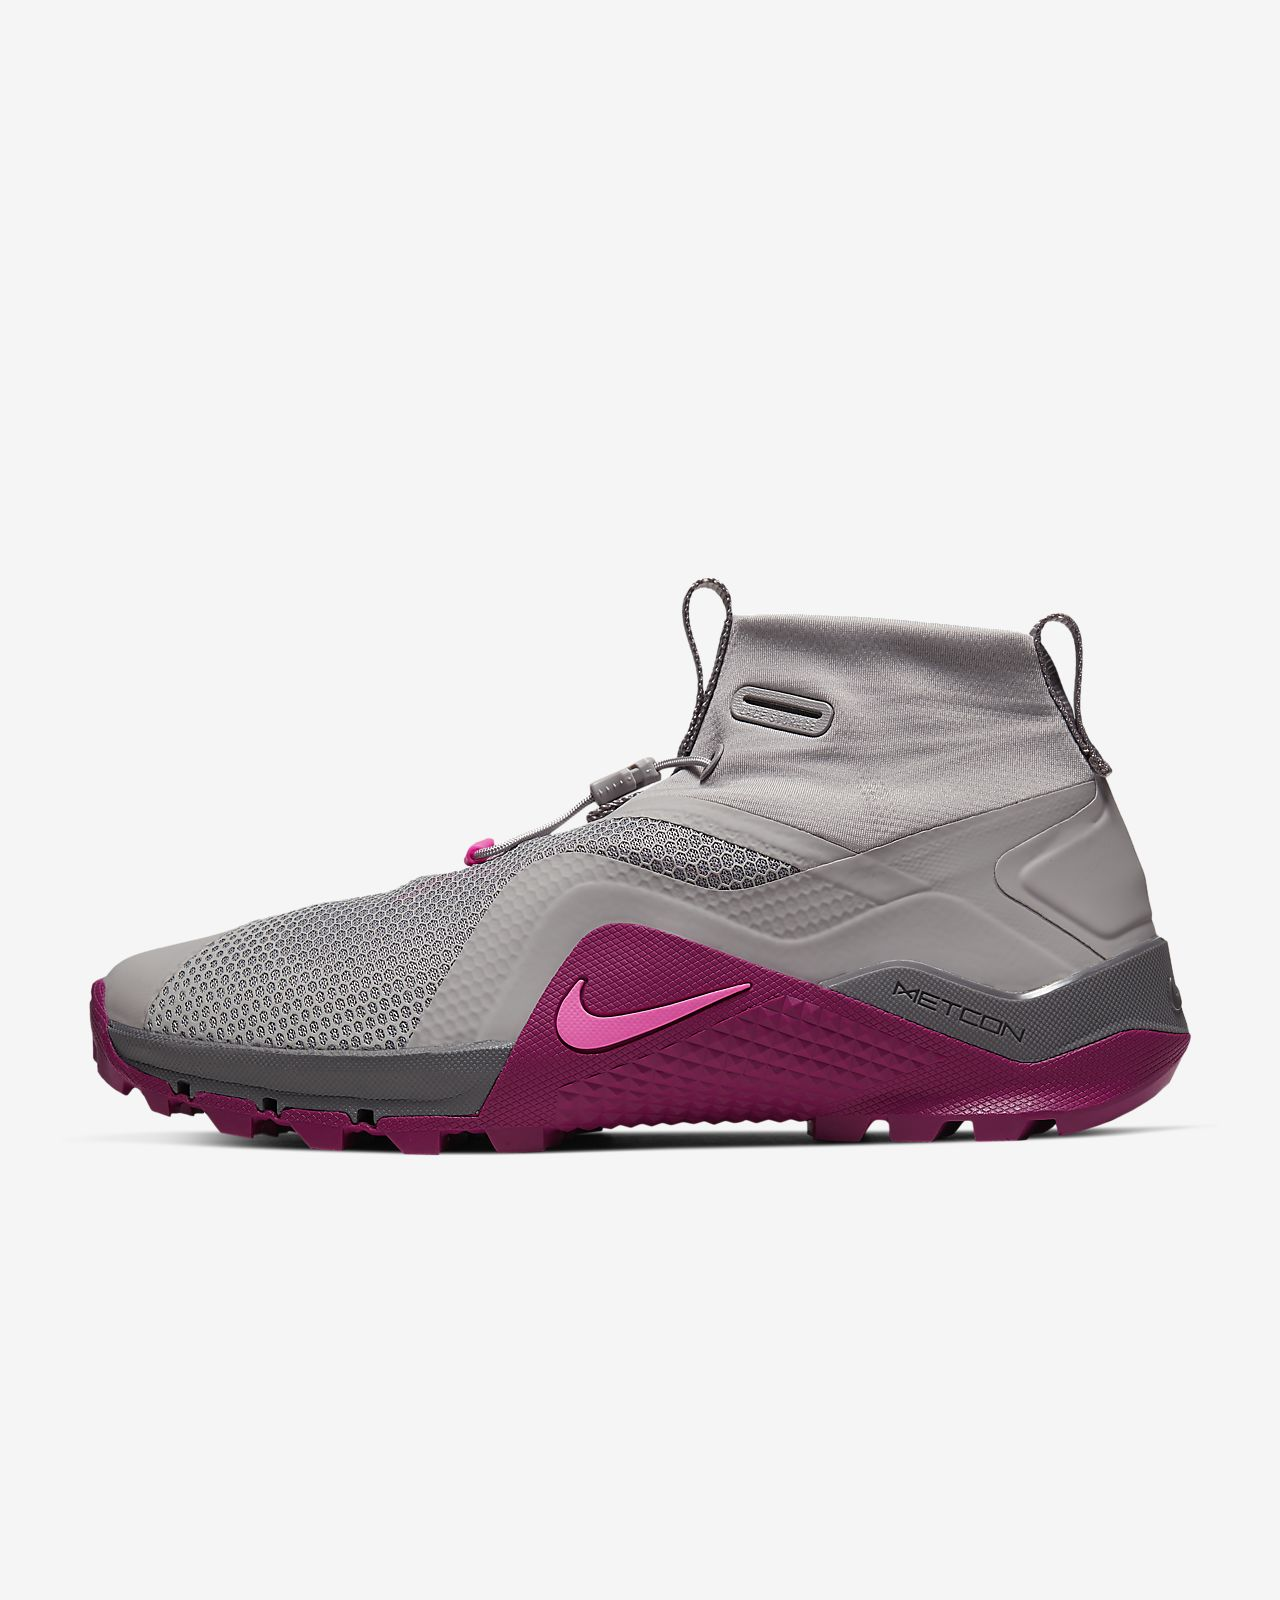 Nike MetconSF Trainingsschoen